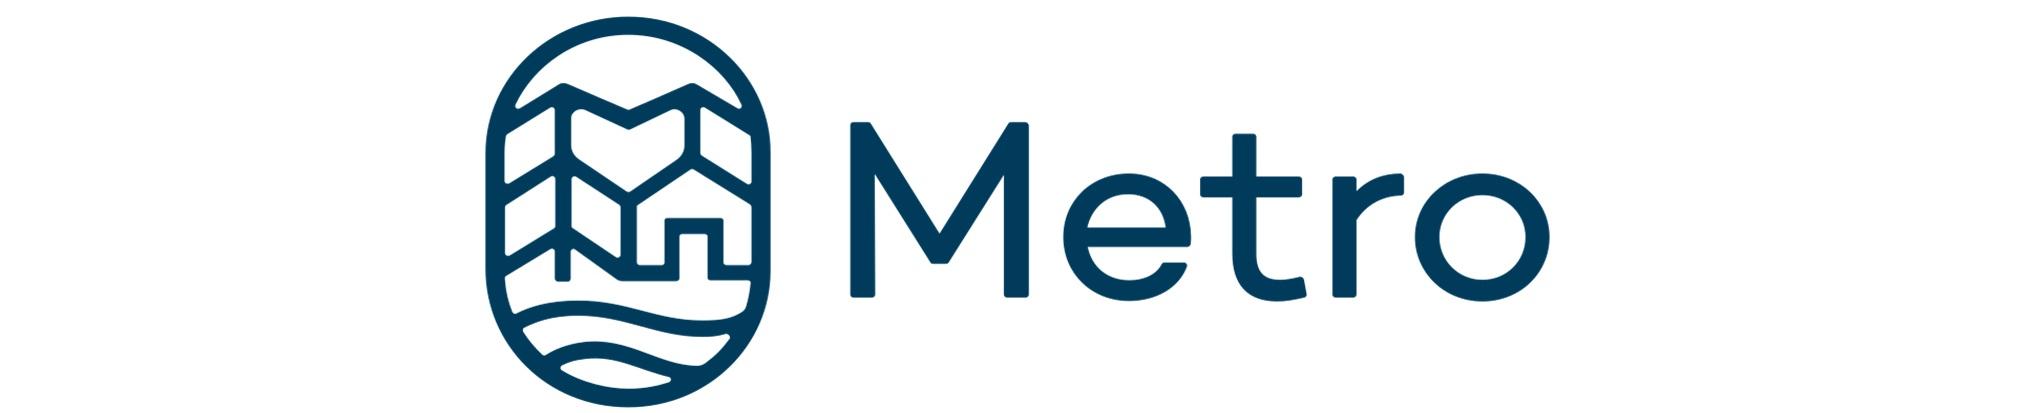 Metro+sized.jpg